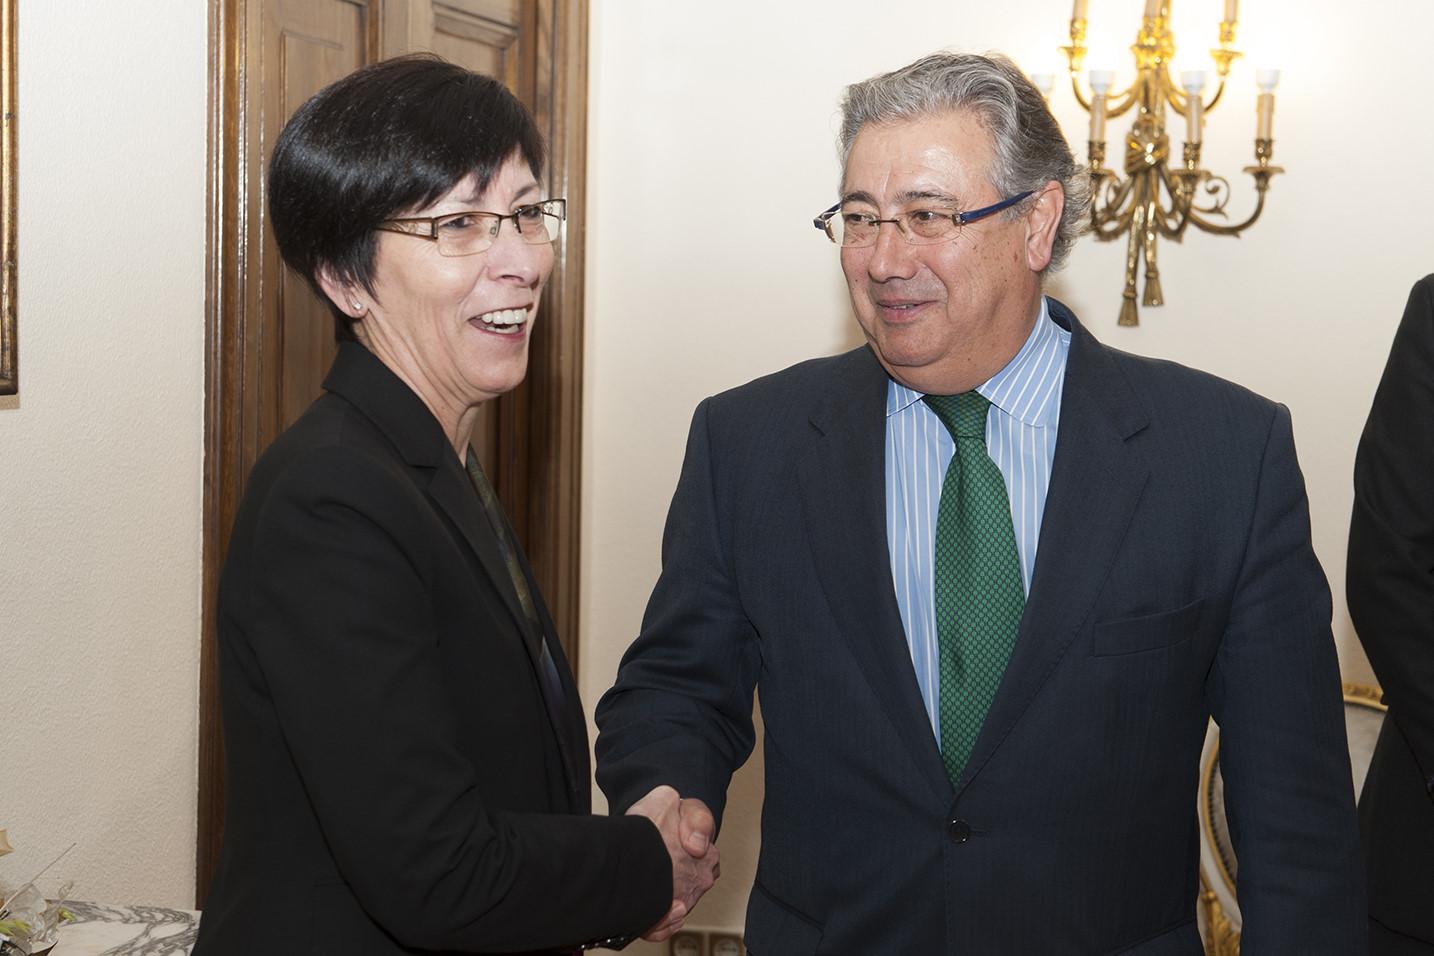 Irekia eusko jaurlaritza gobierno vasco la consejera for Nombre del ministro de interior